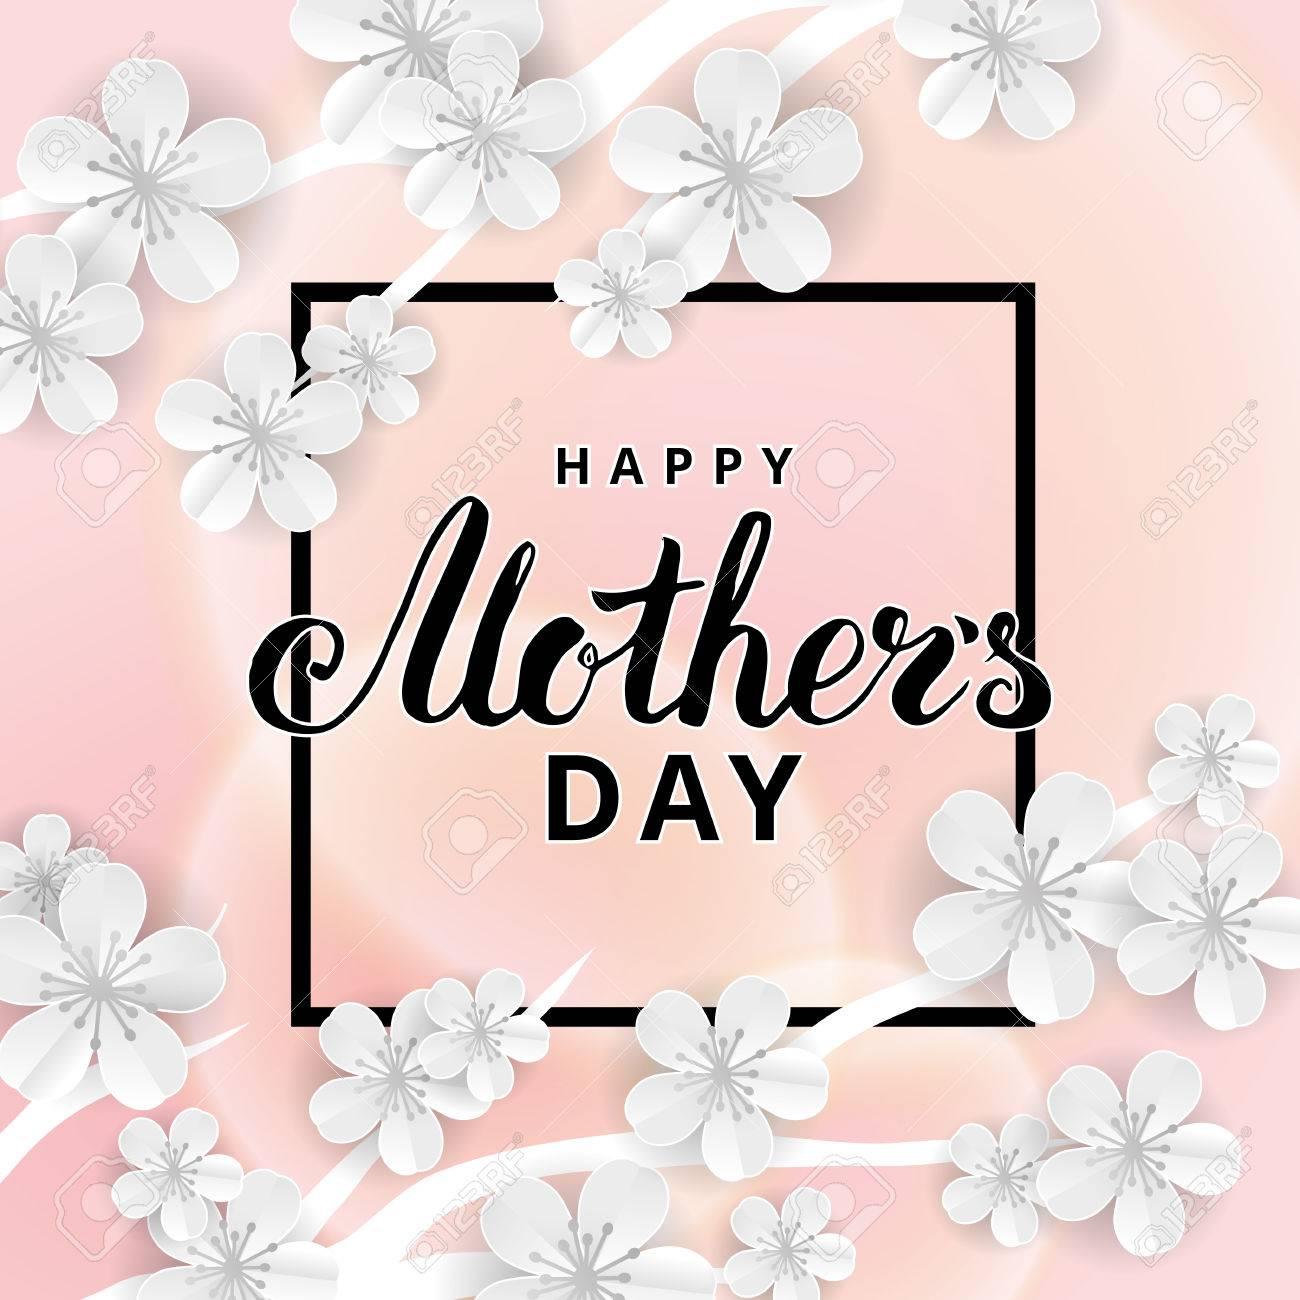 Happy Mothers day sakura flower - 75070187